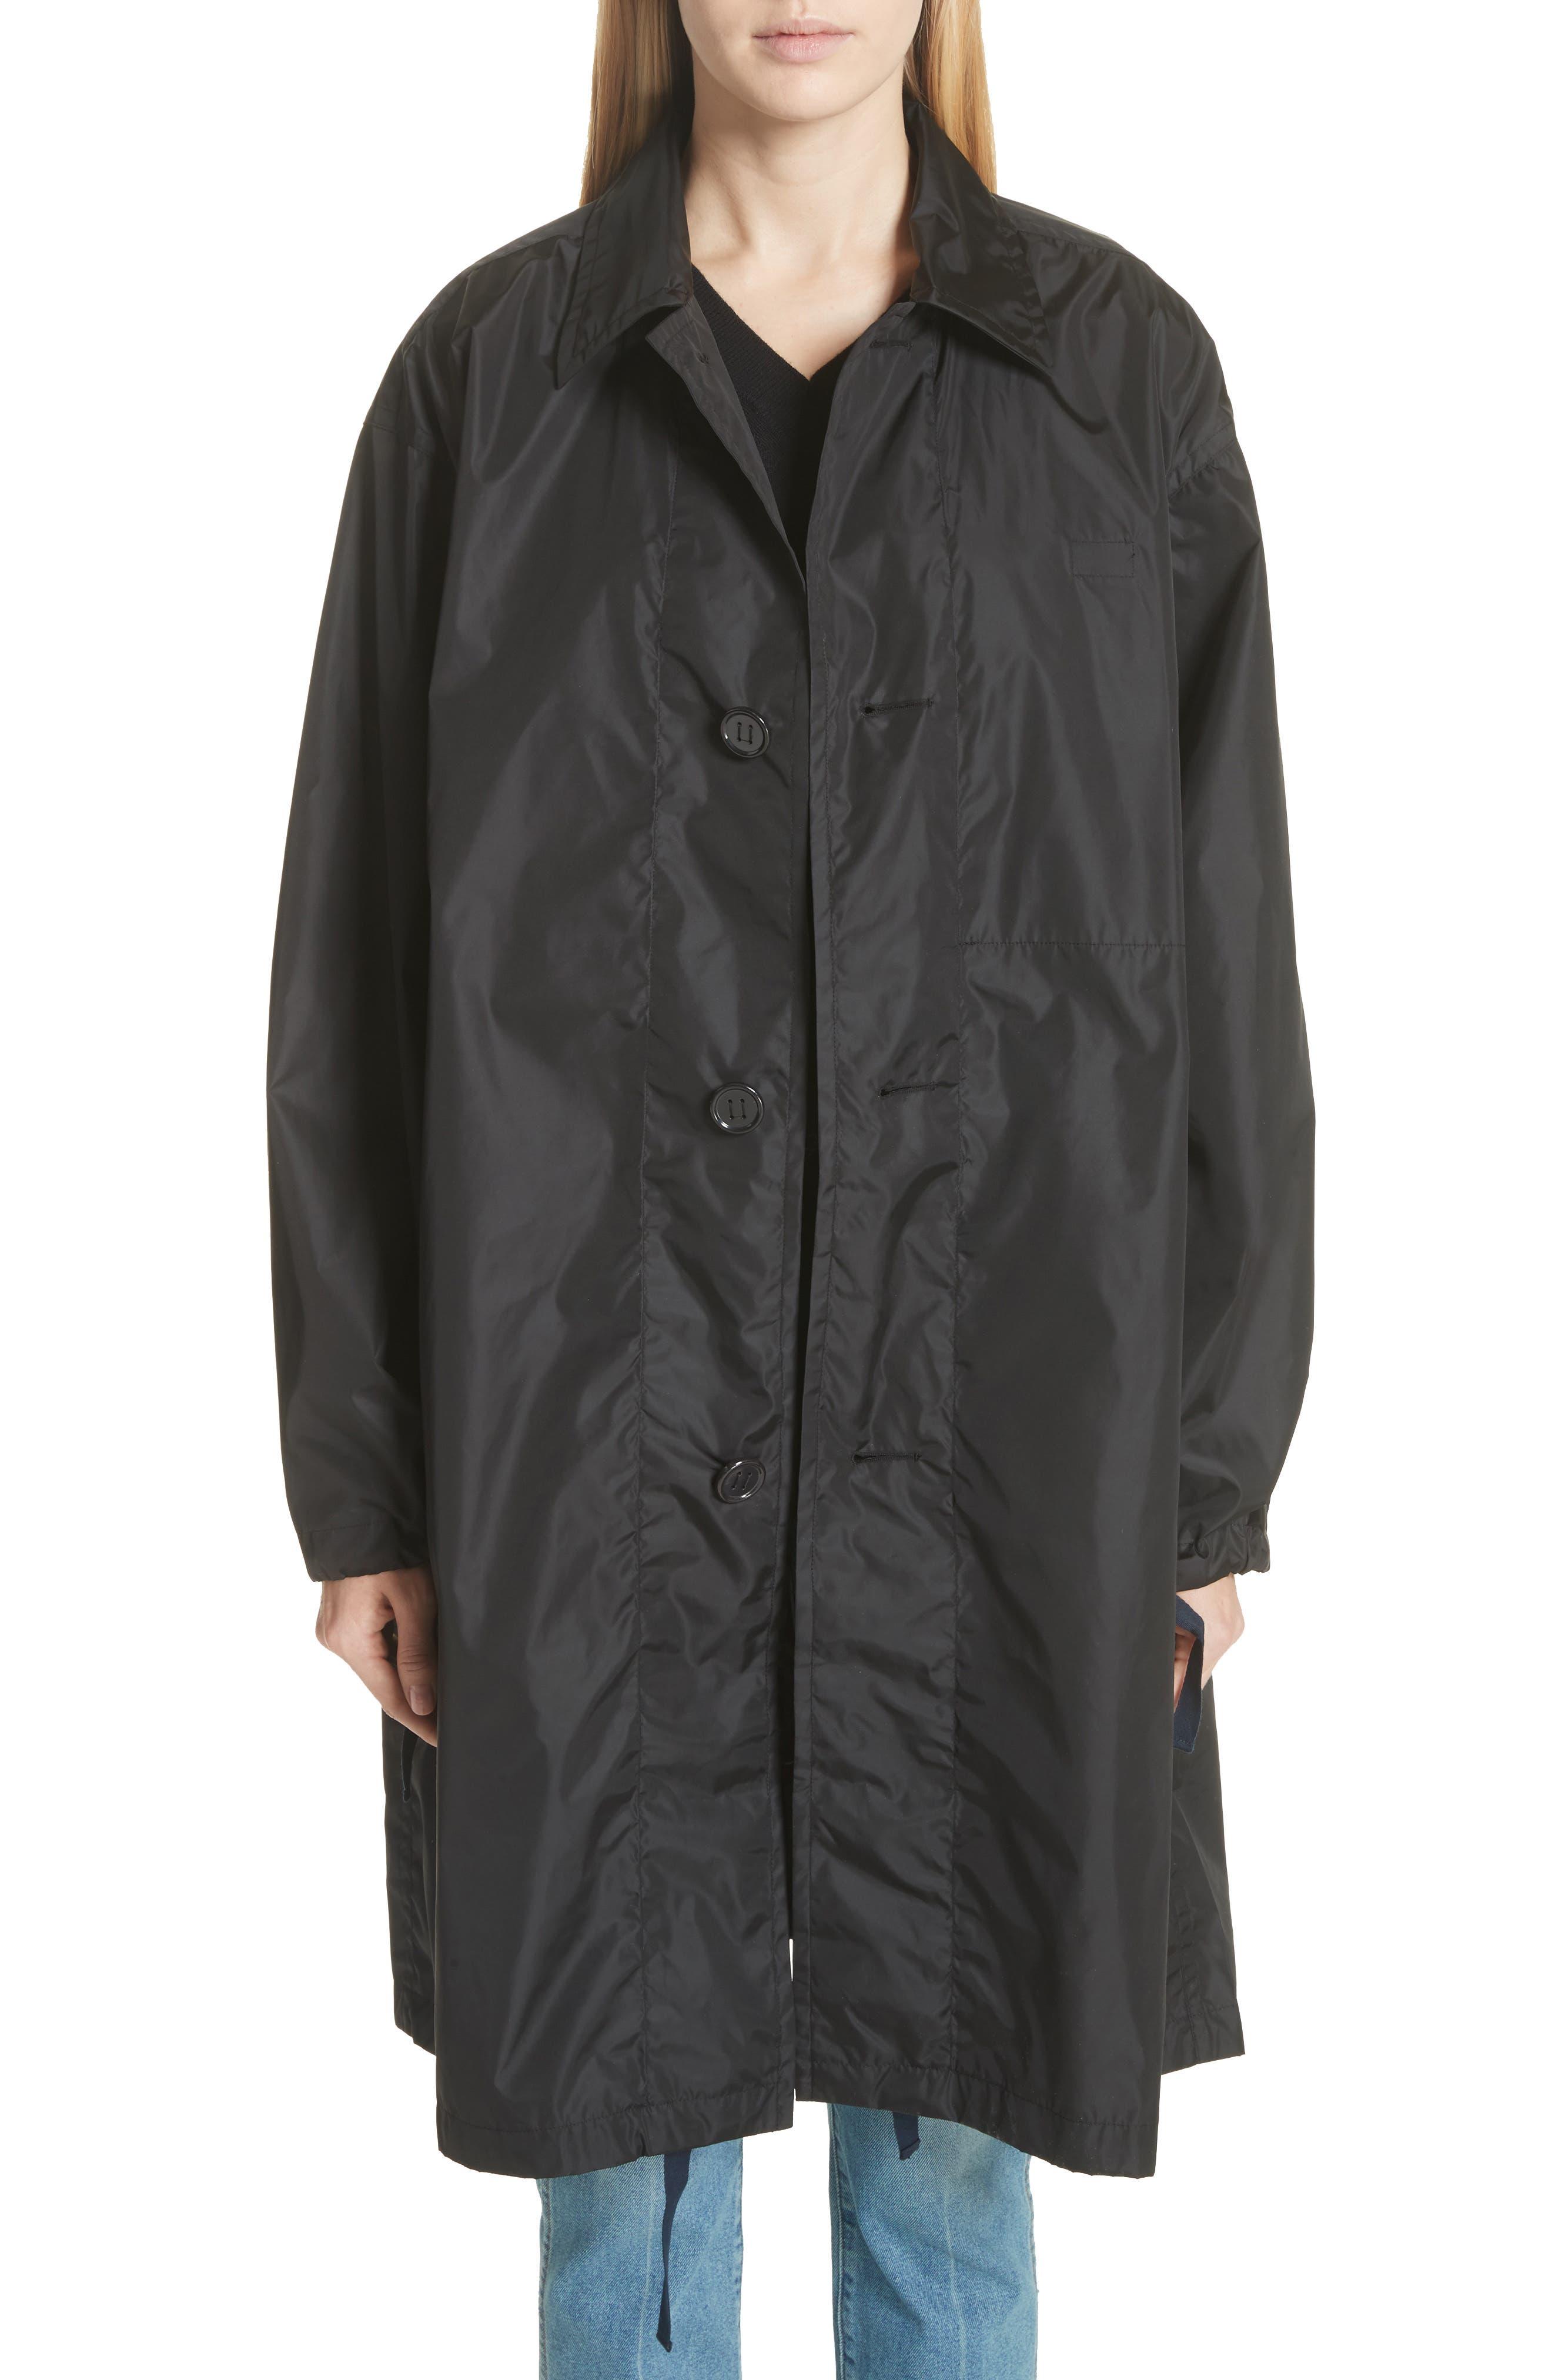 Raincoat with Inside Suspenders,                             Main thumbnail 1, color,                             Black